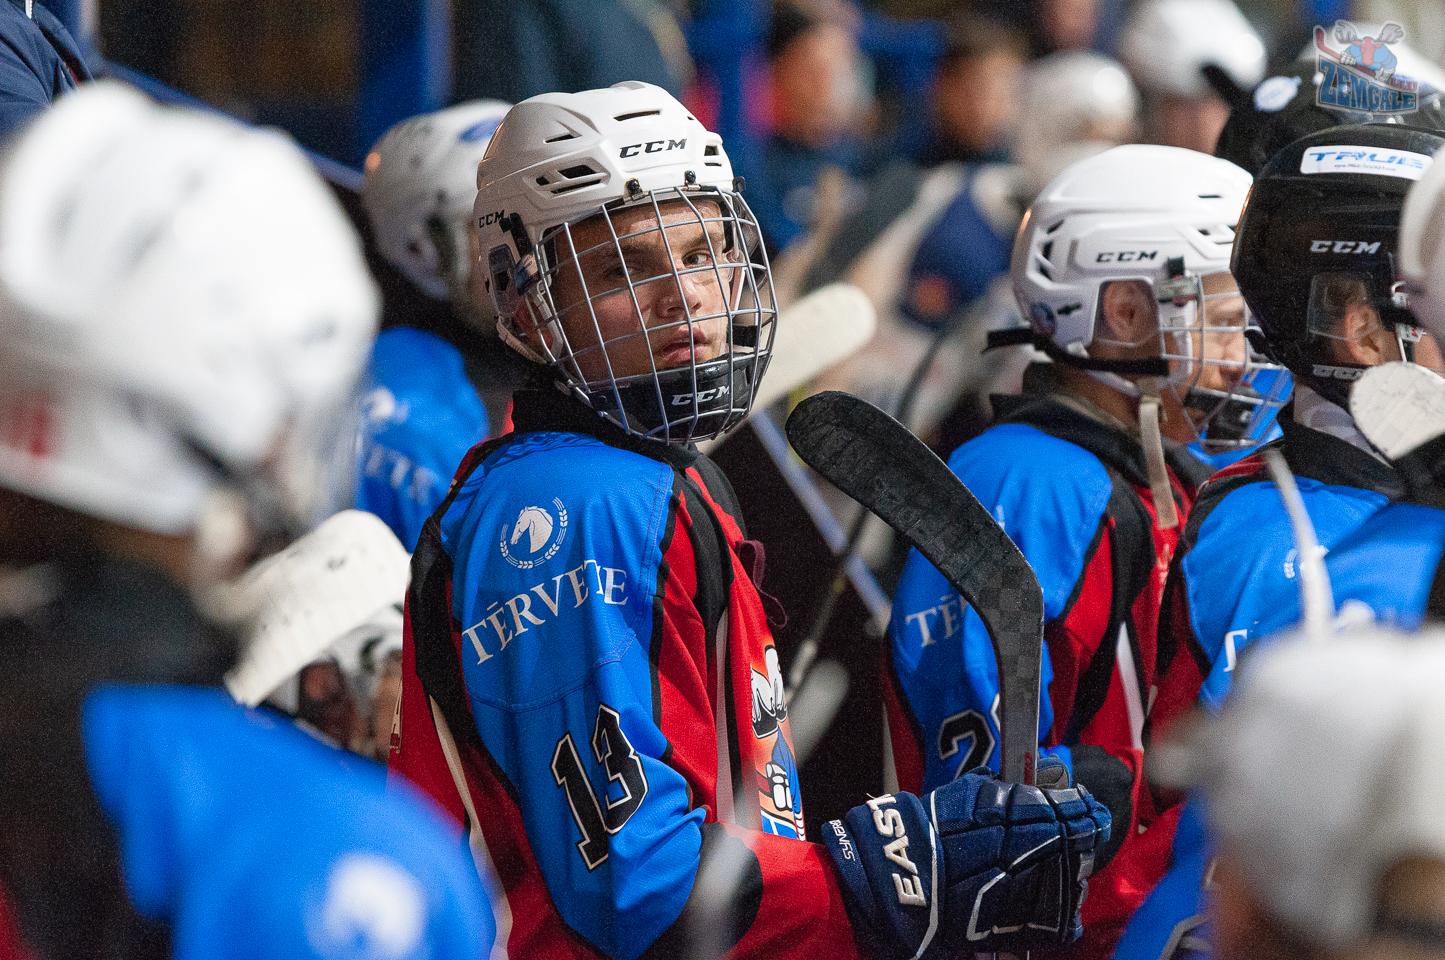 Jelgavas hokeja skola JLSS U17 - Venta 2002 14092019-28